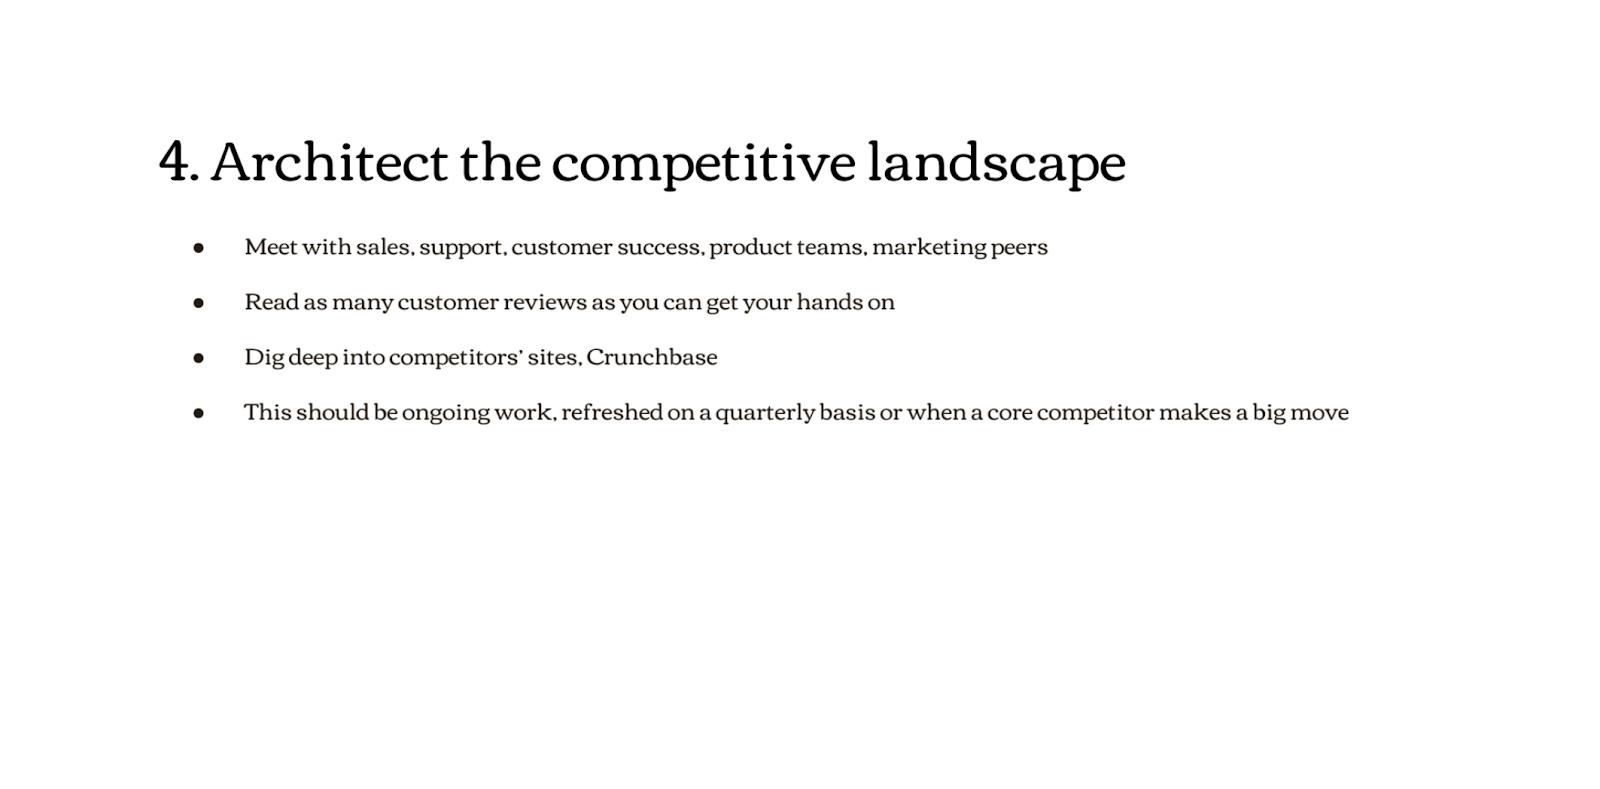 Architect the competitive landscape